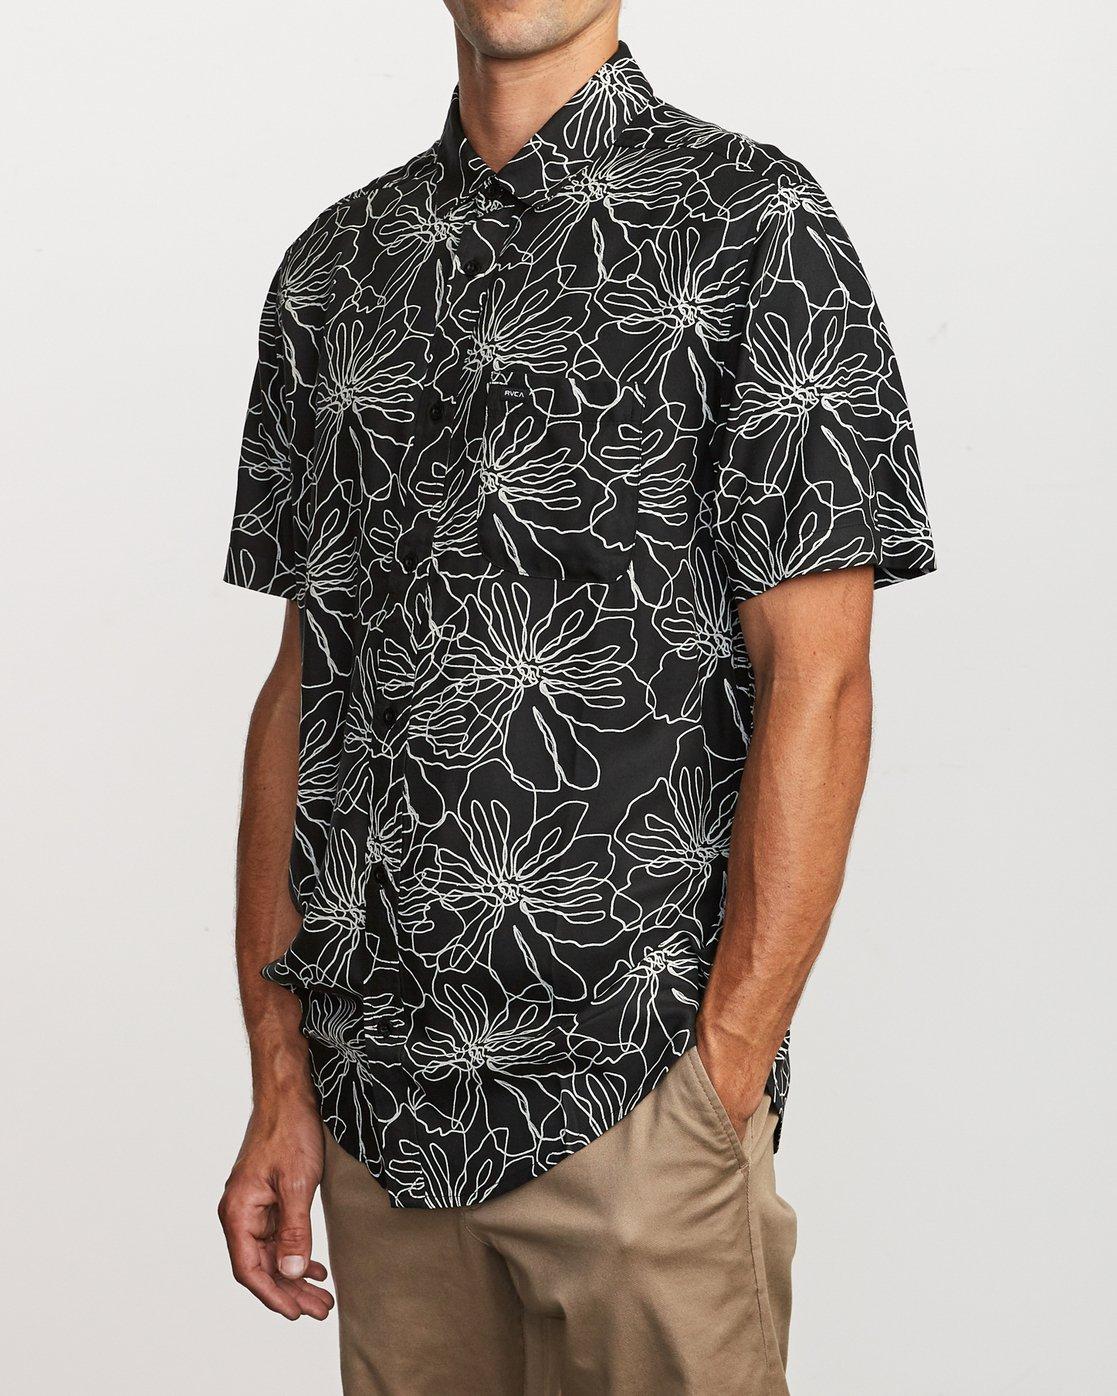 2 Blind Floral Button-Up Shirt Black M506VRBF RVCA